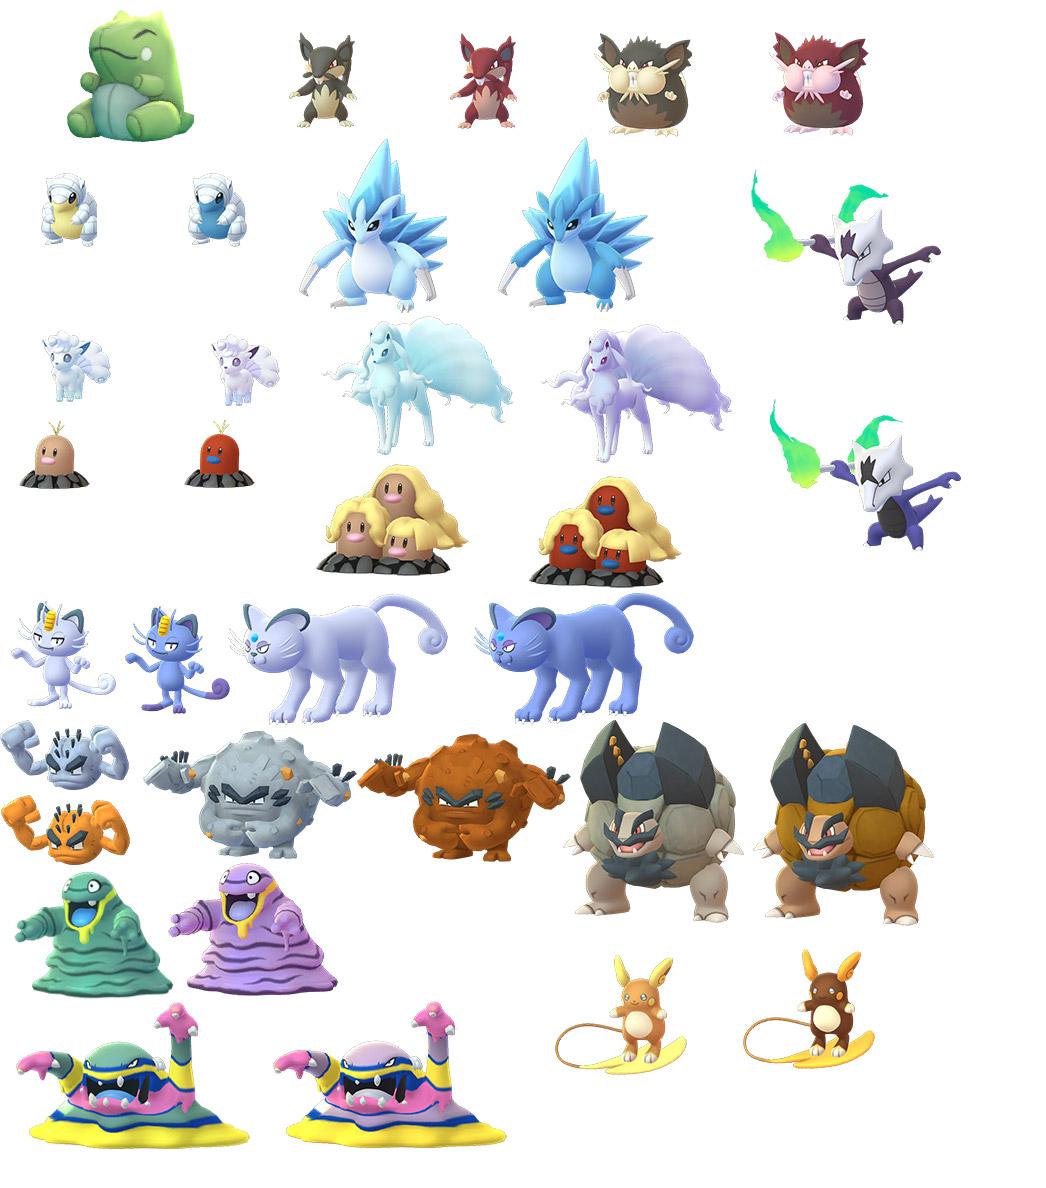 Pokemon Go Datamine Images For Alolan Forms Player